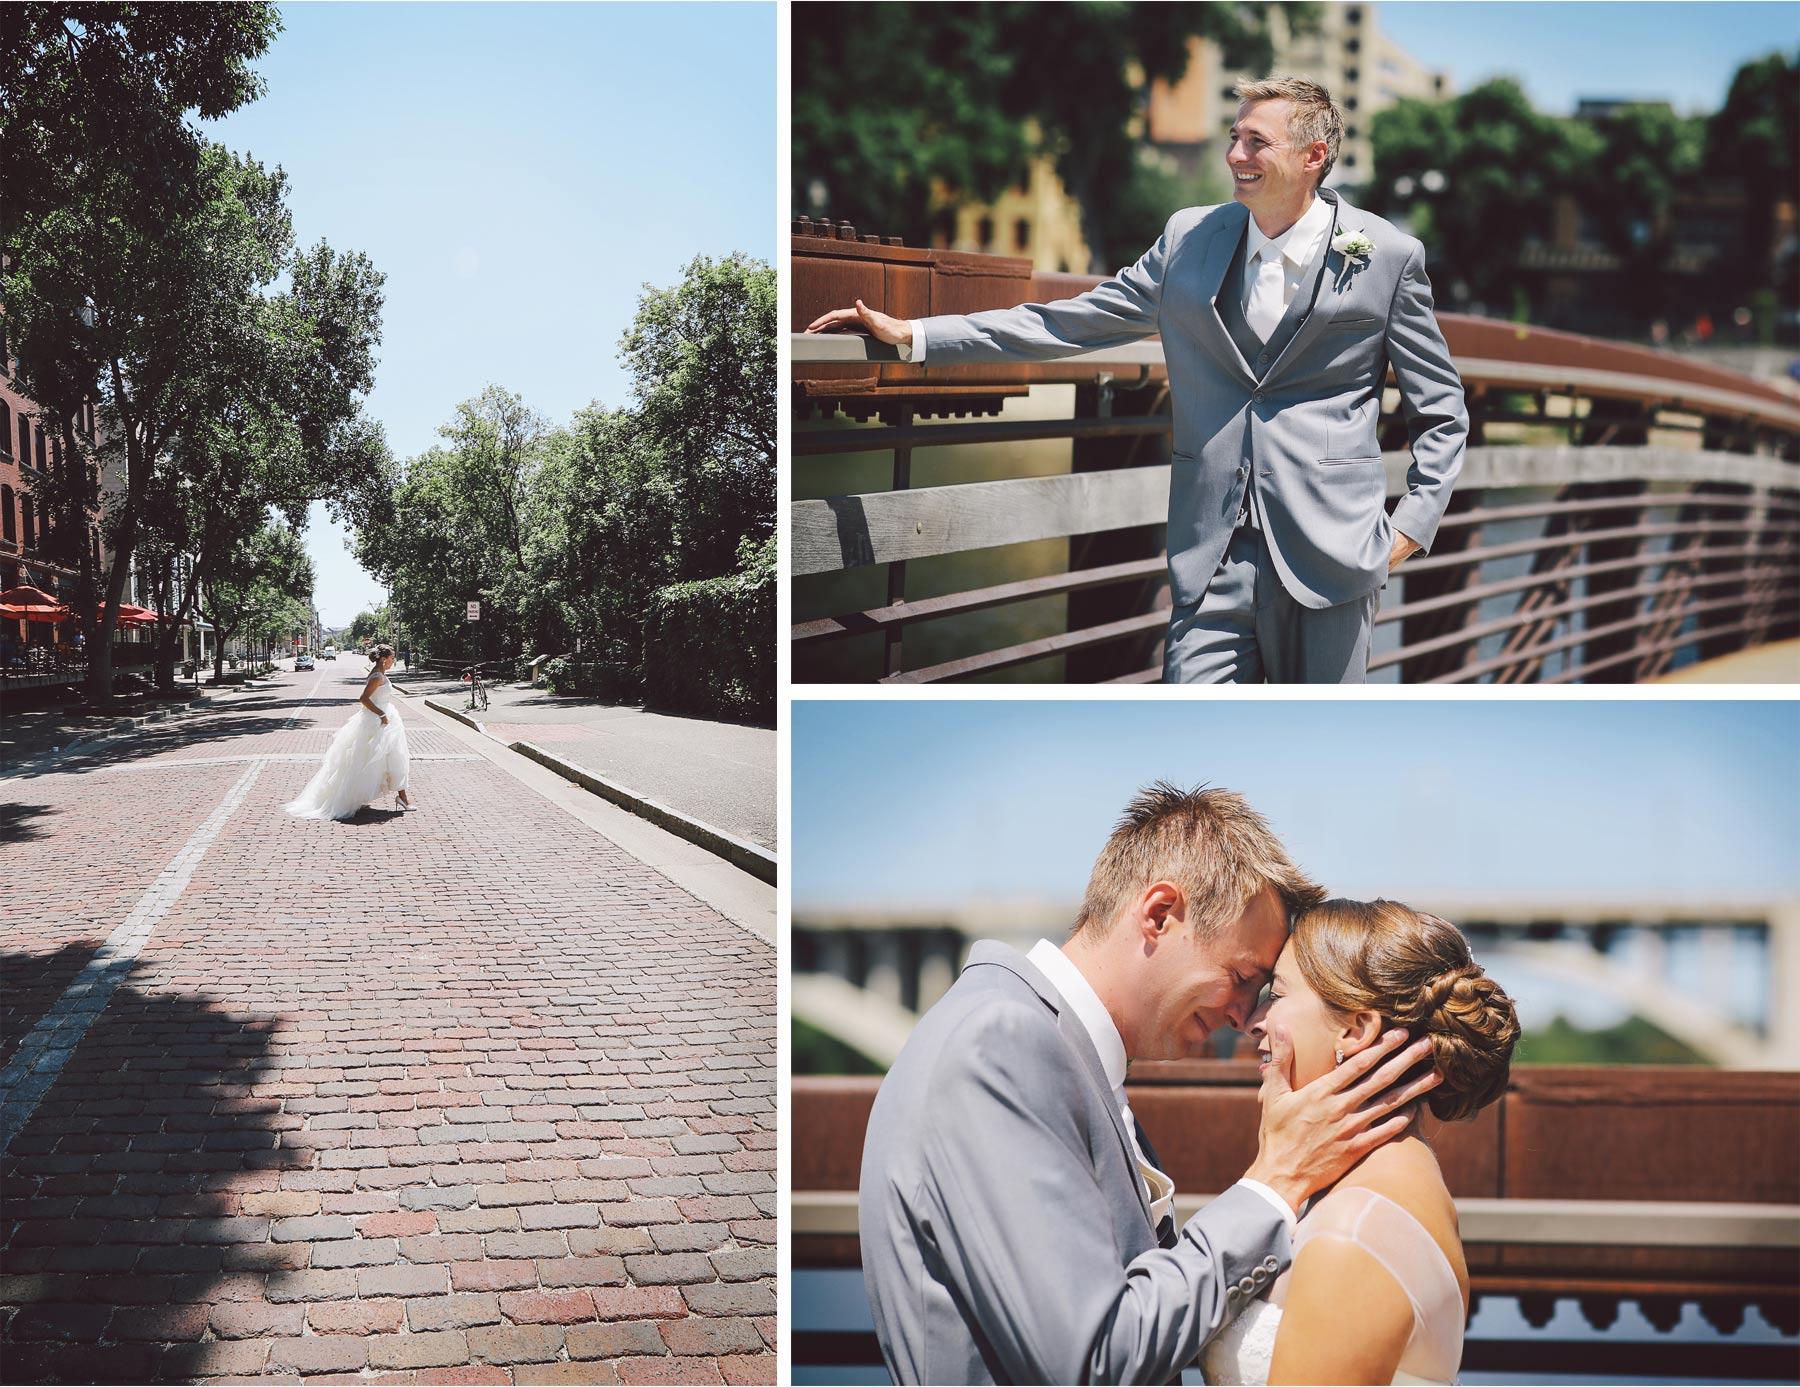 04-Minneapolis-Minnesota-Wedding-Photography-by-Vick-Photography-Saint-Anthony-Main-First-Look-Brigid-and-Ernie.jpg